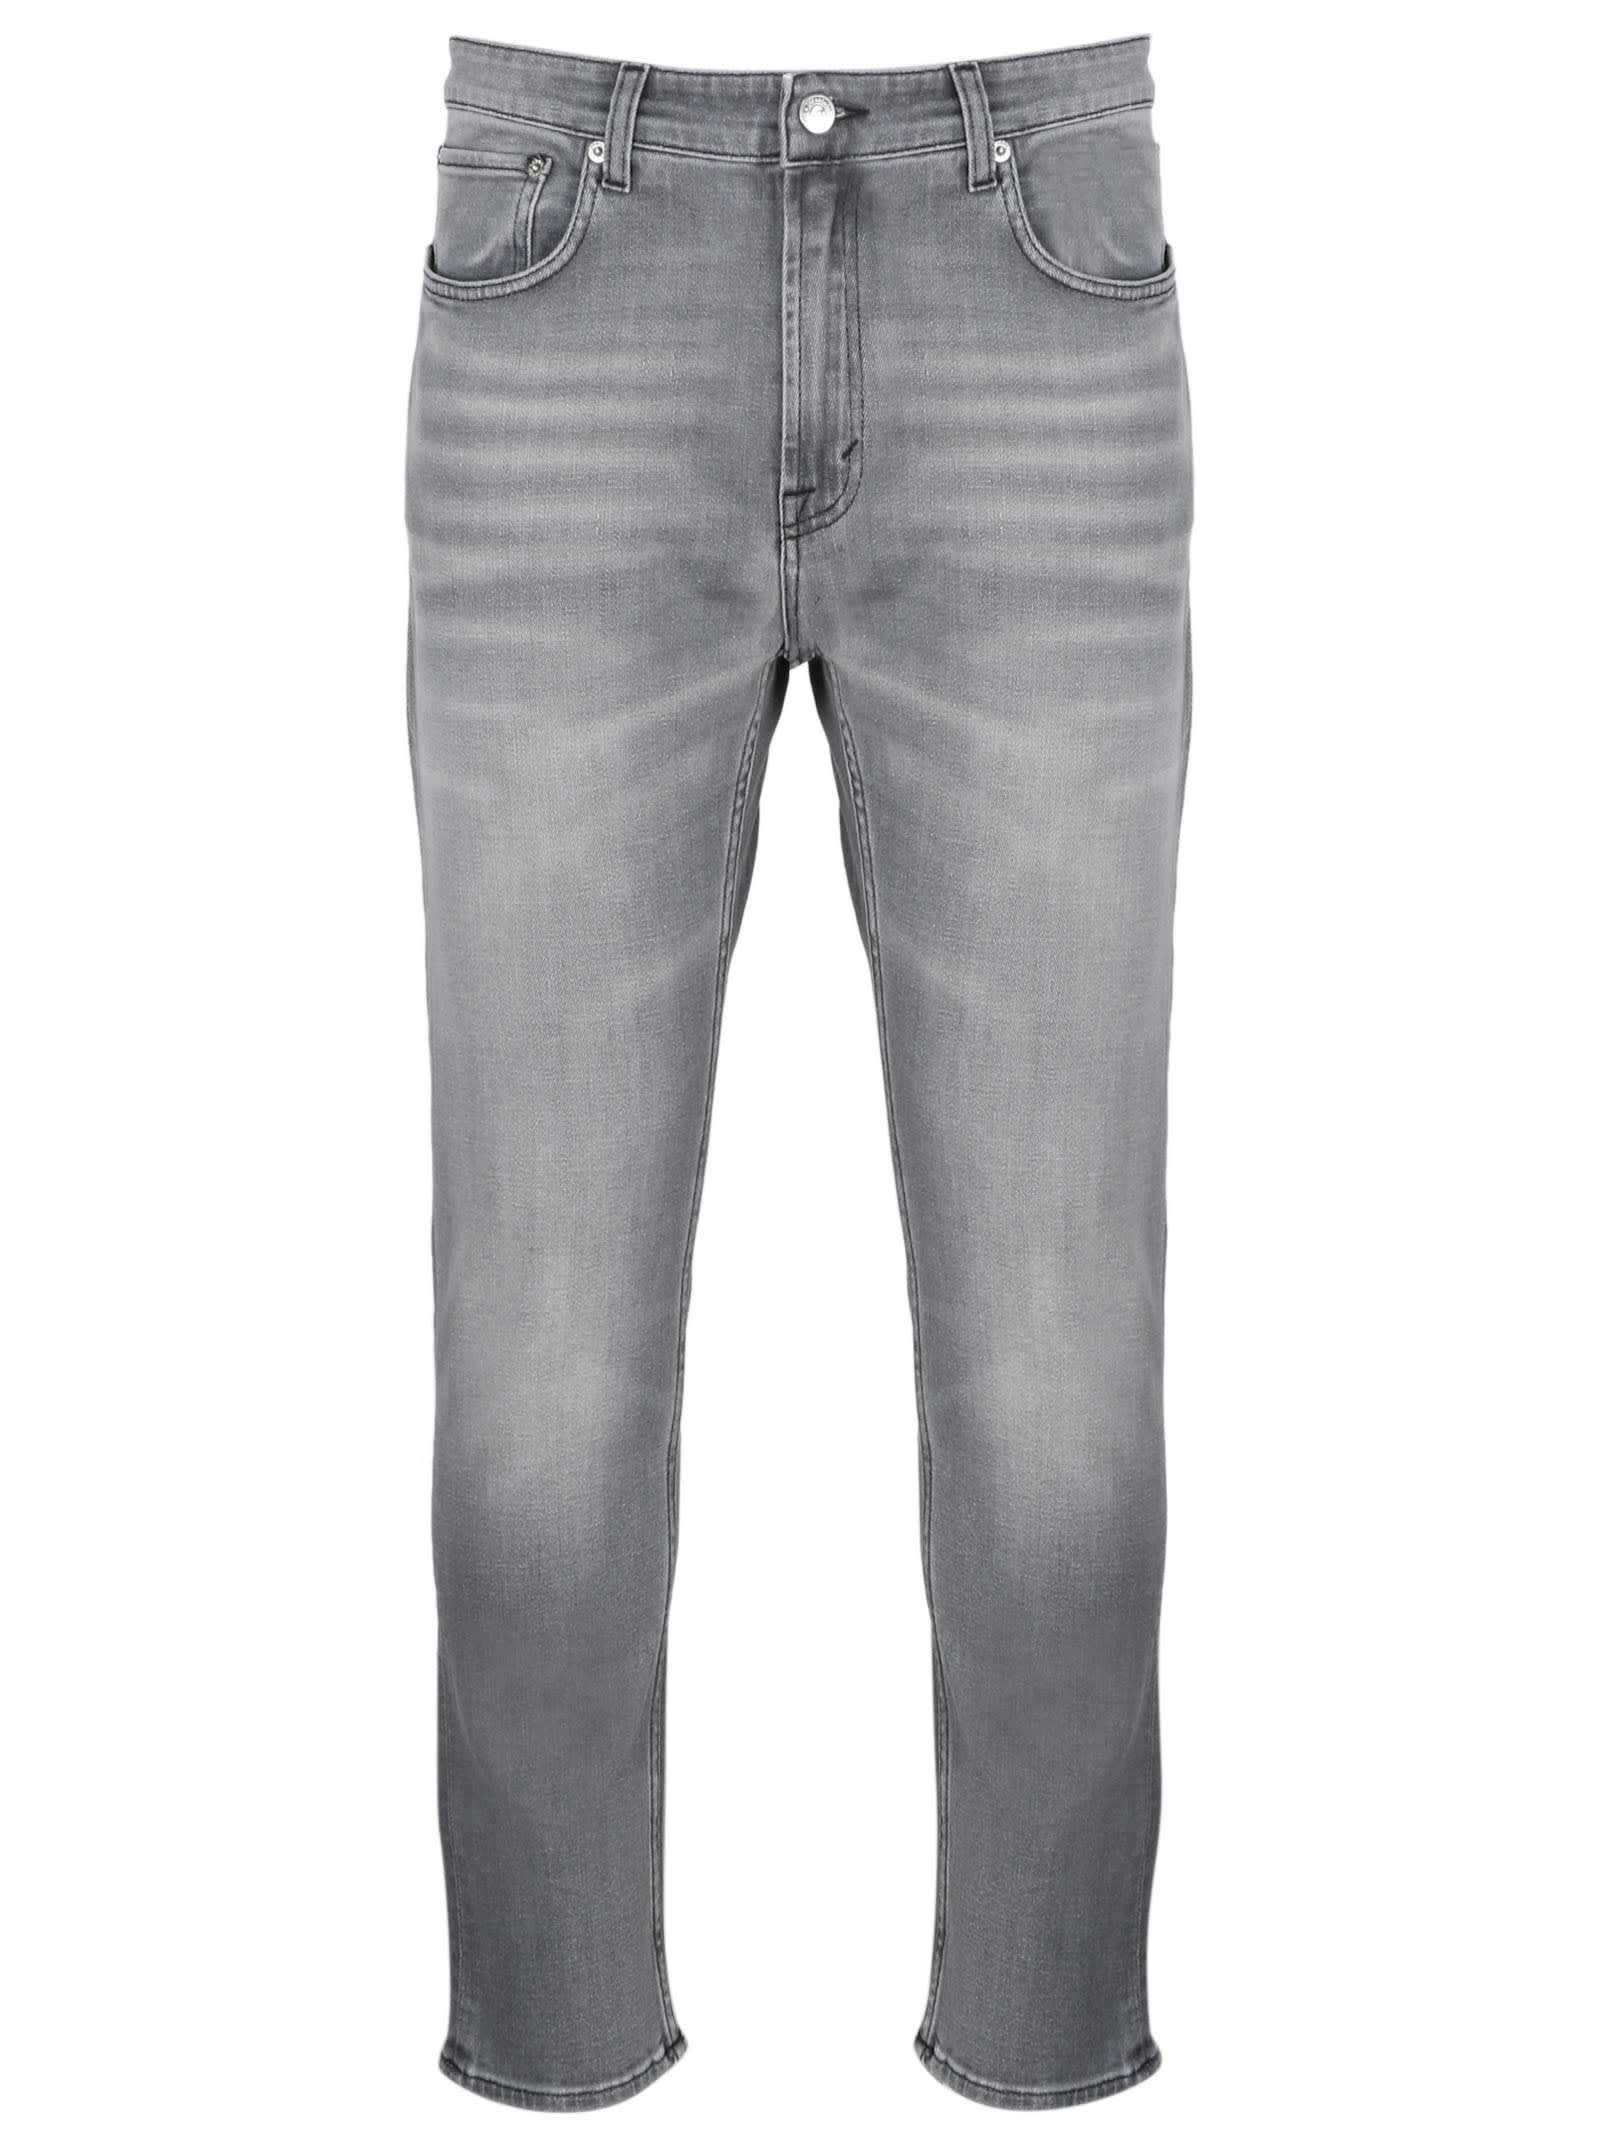 Department 5 Pri J New Jeans